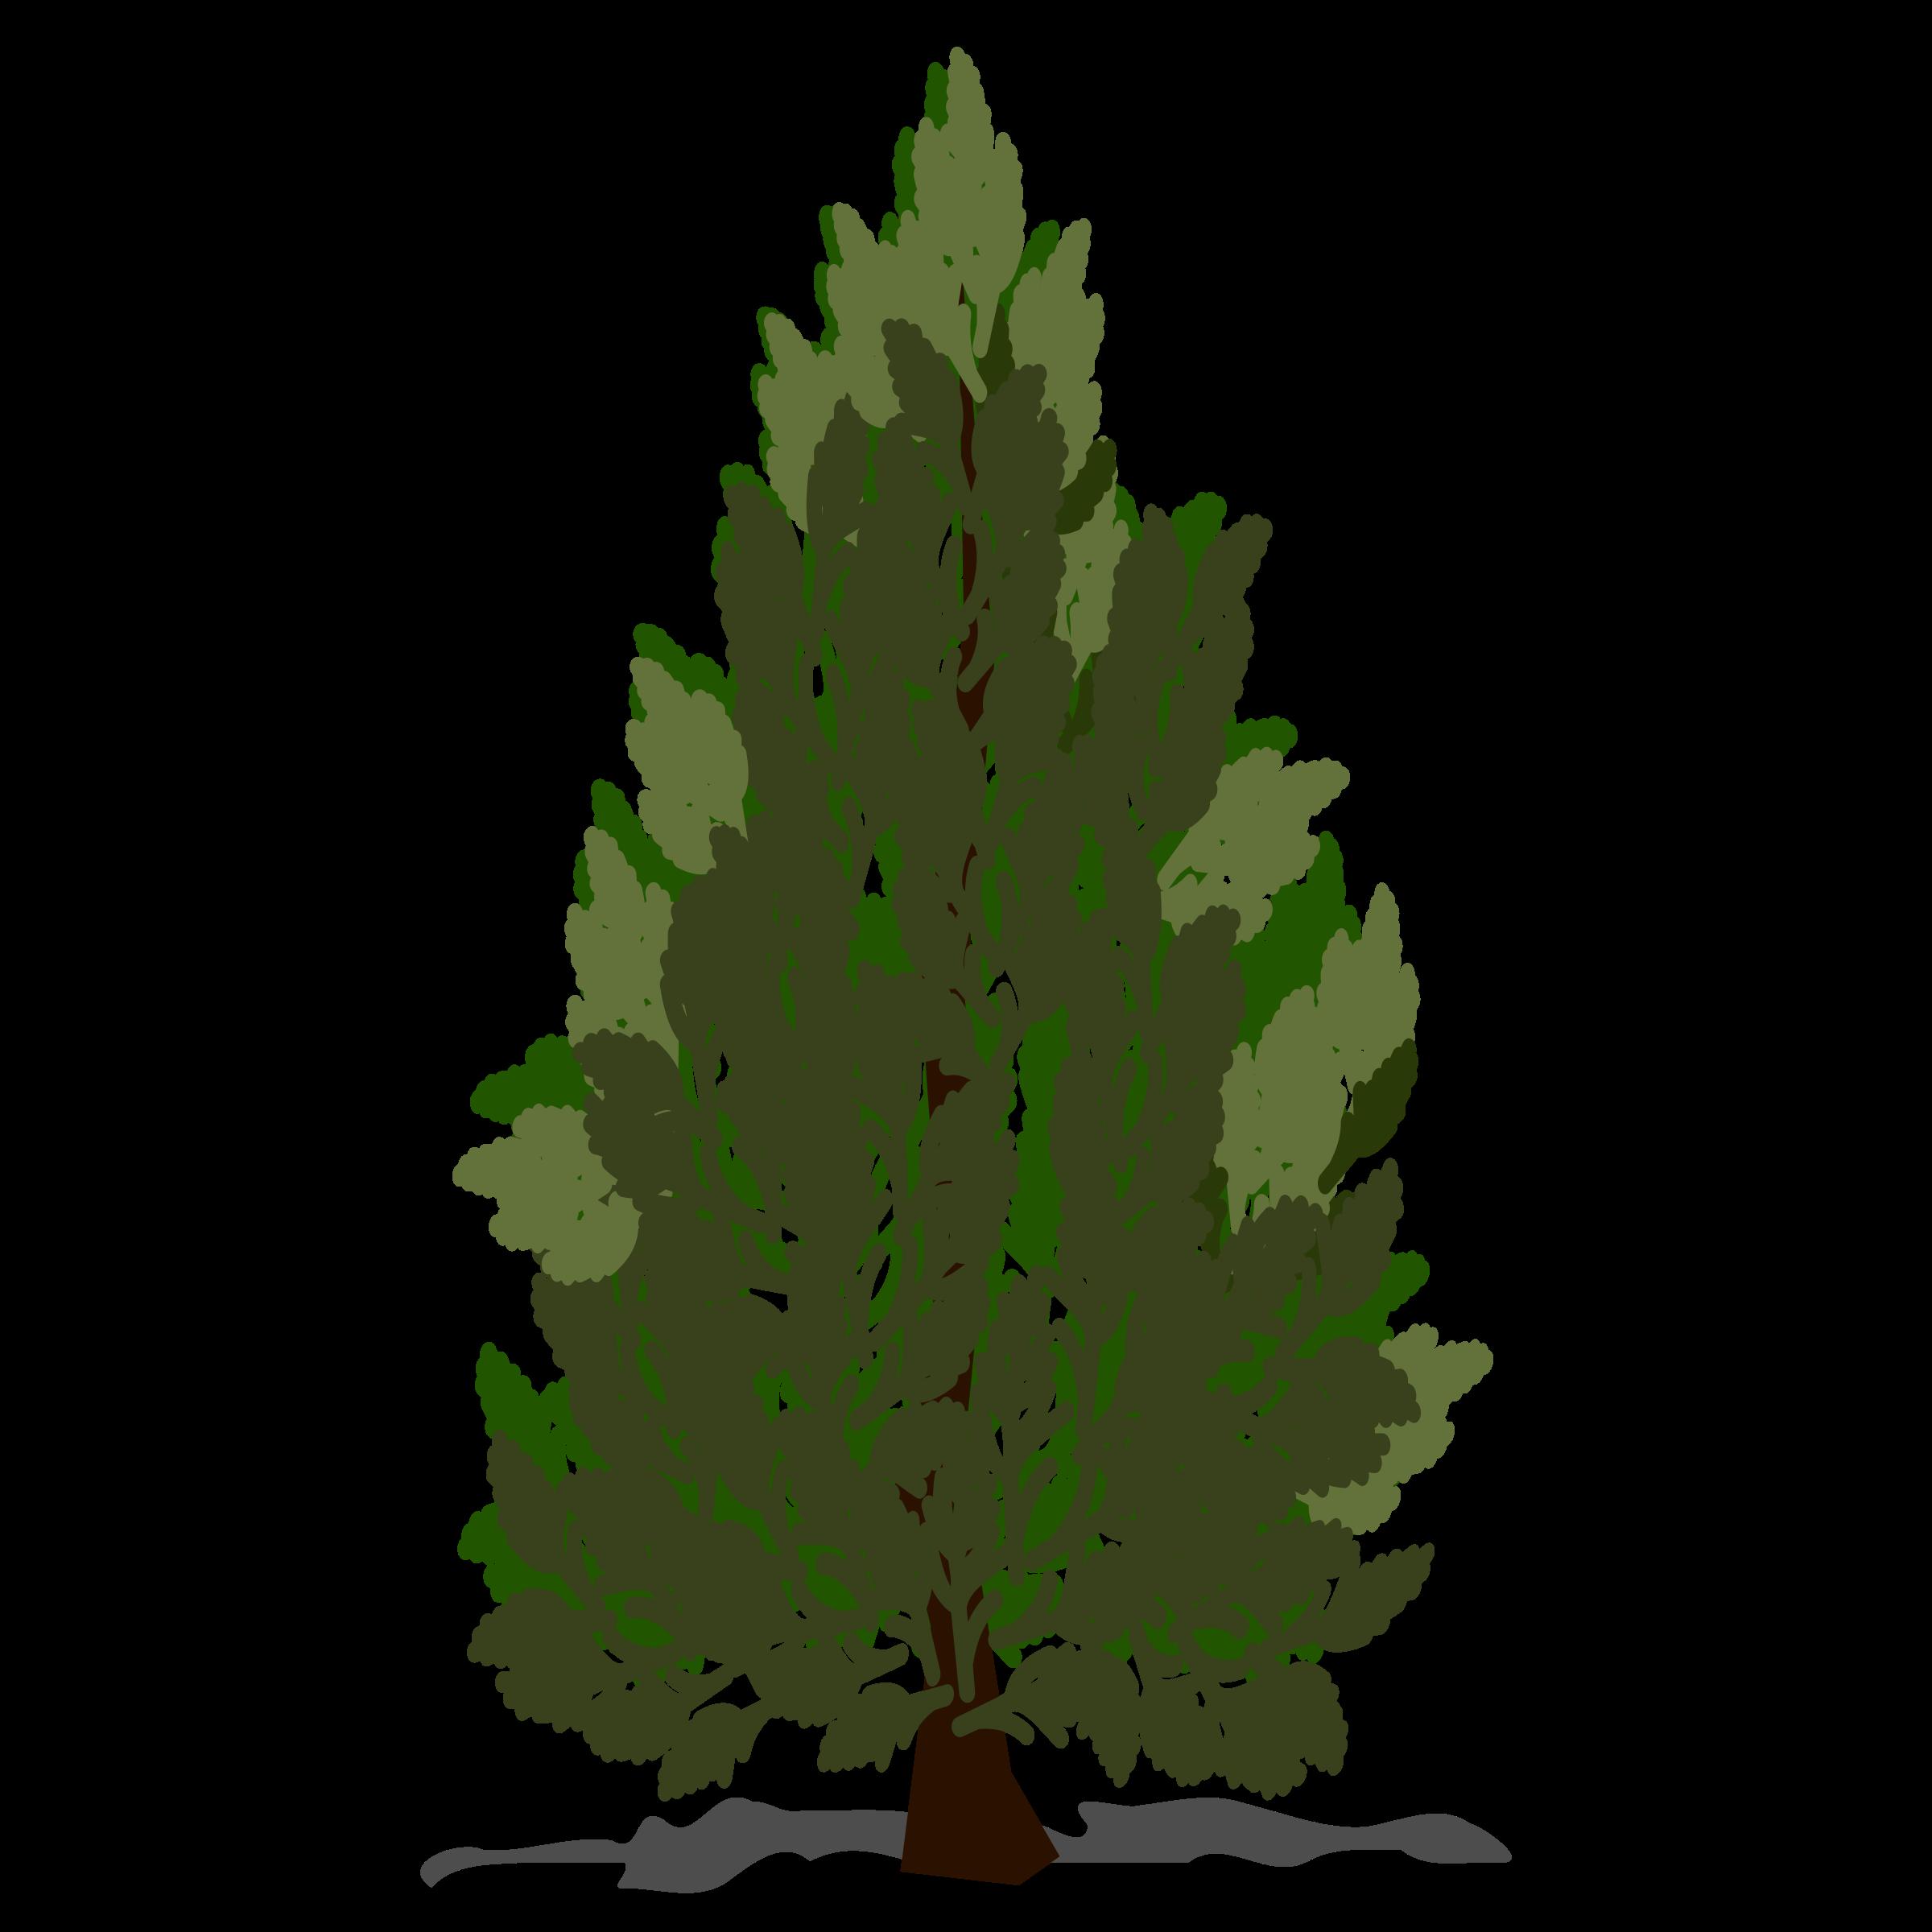 Leaf clipart pine tree. Big image png